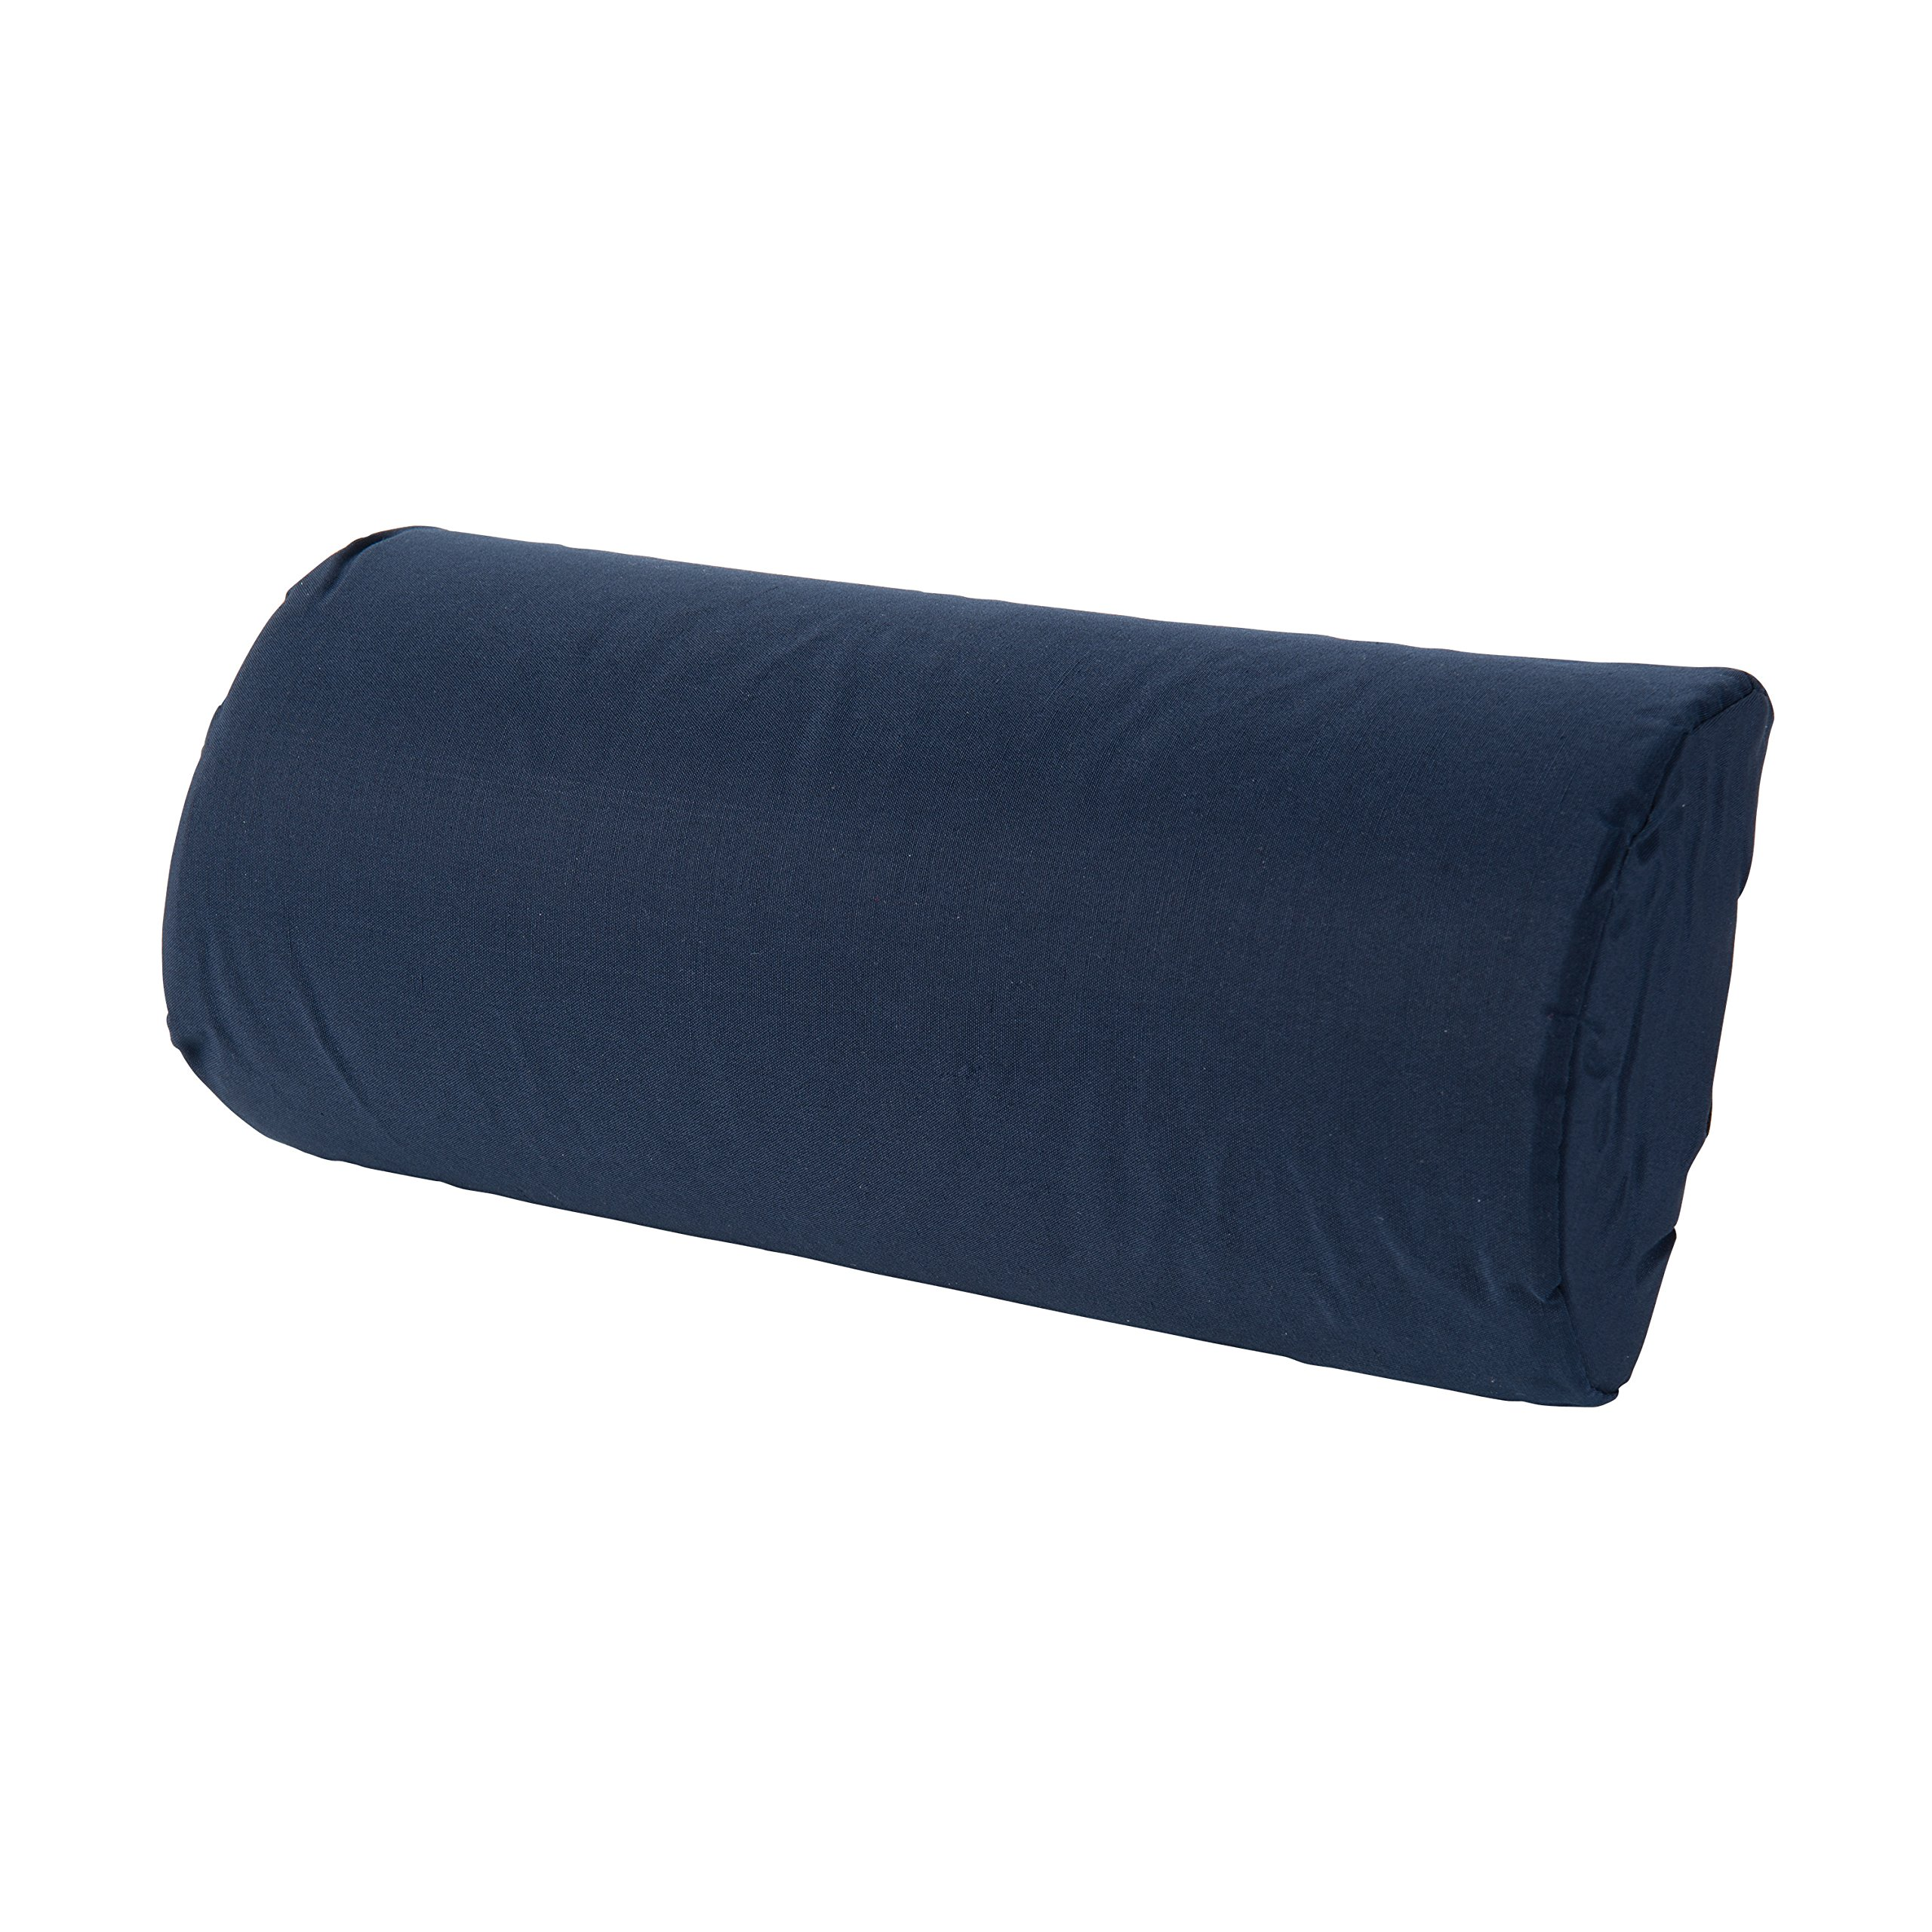 DMI Lumbar Roll Back Support Cushion Pillow, Half-Moon Size, Navy